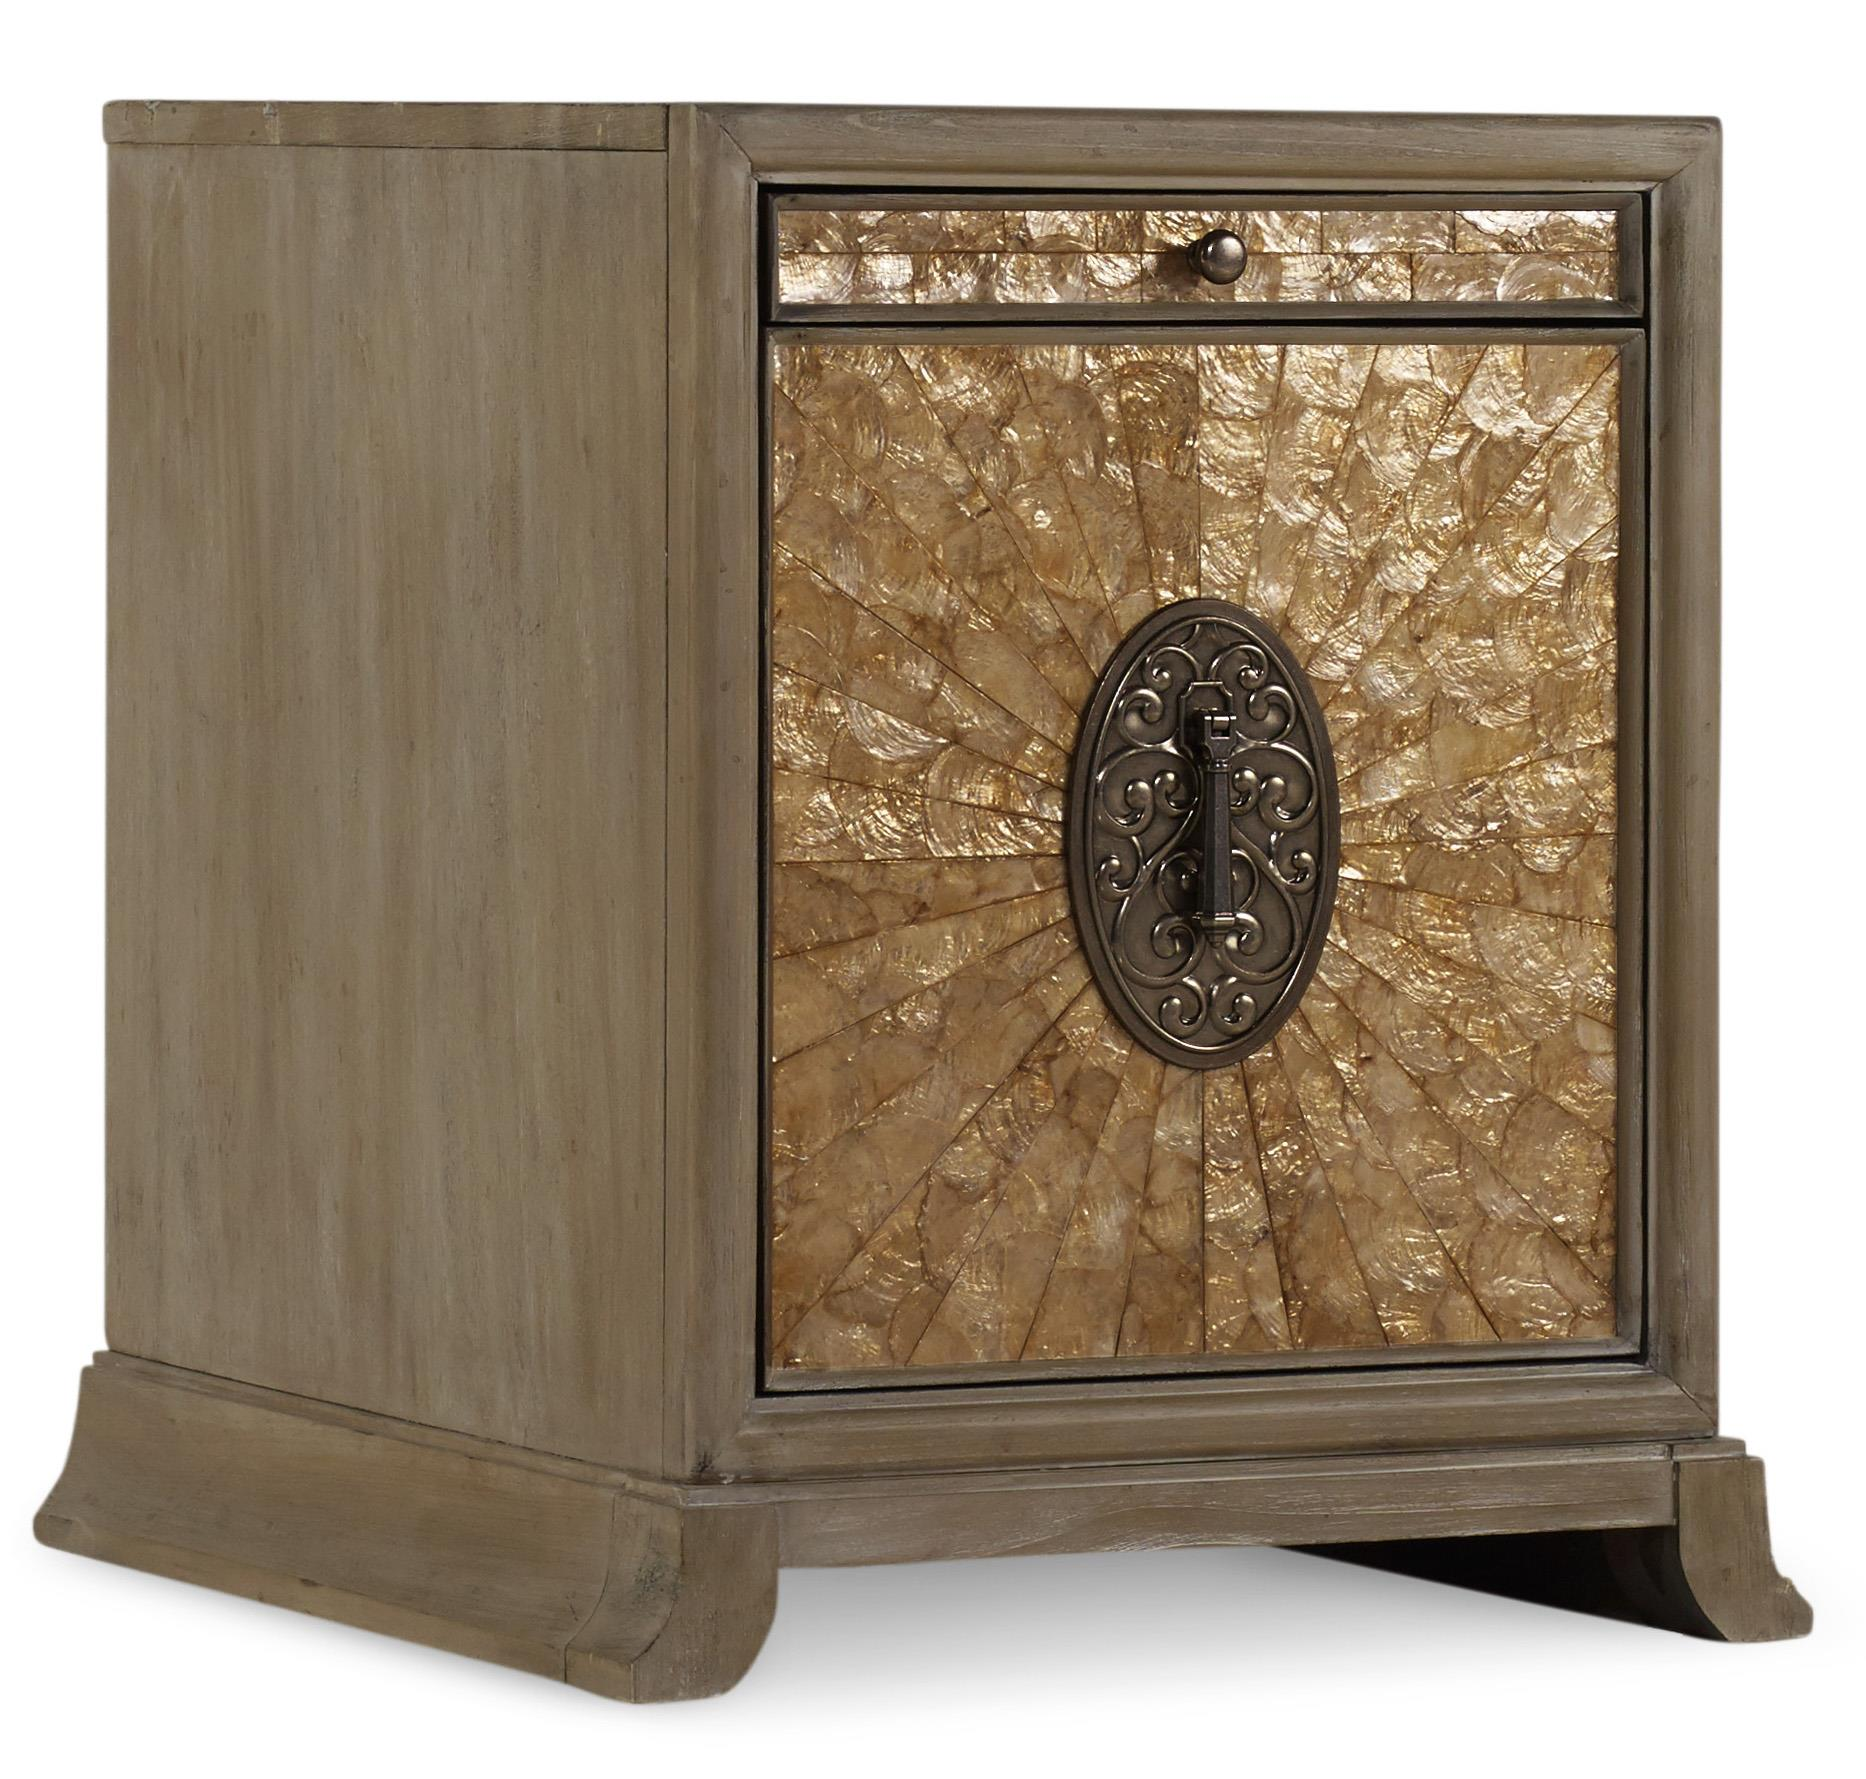 Hooker Furniture Mélange Ari Accent File Chest - Item Number: 638-10010